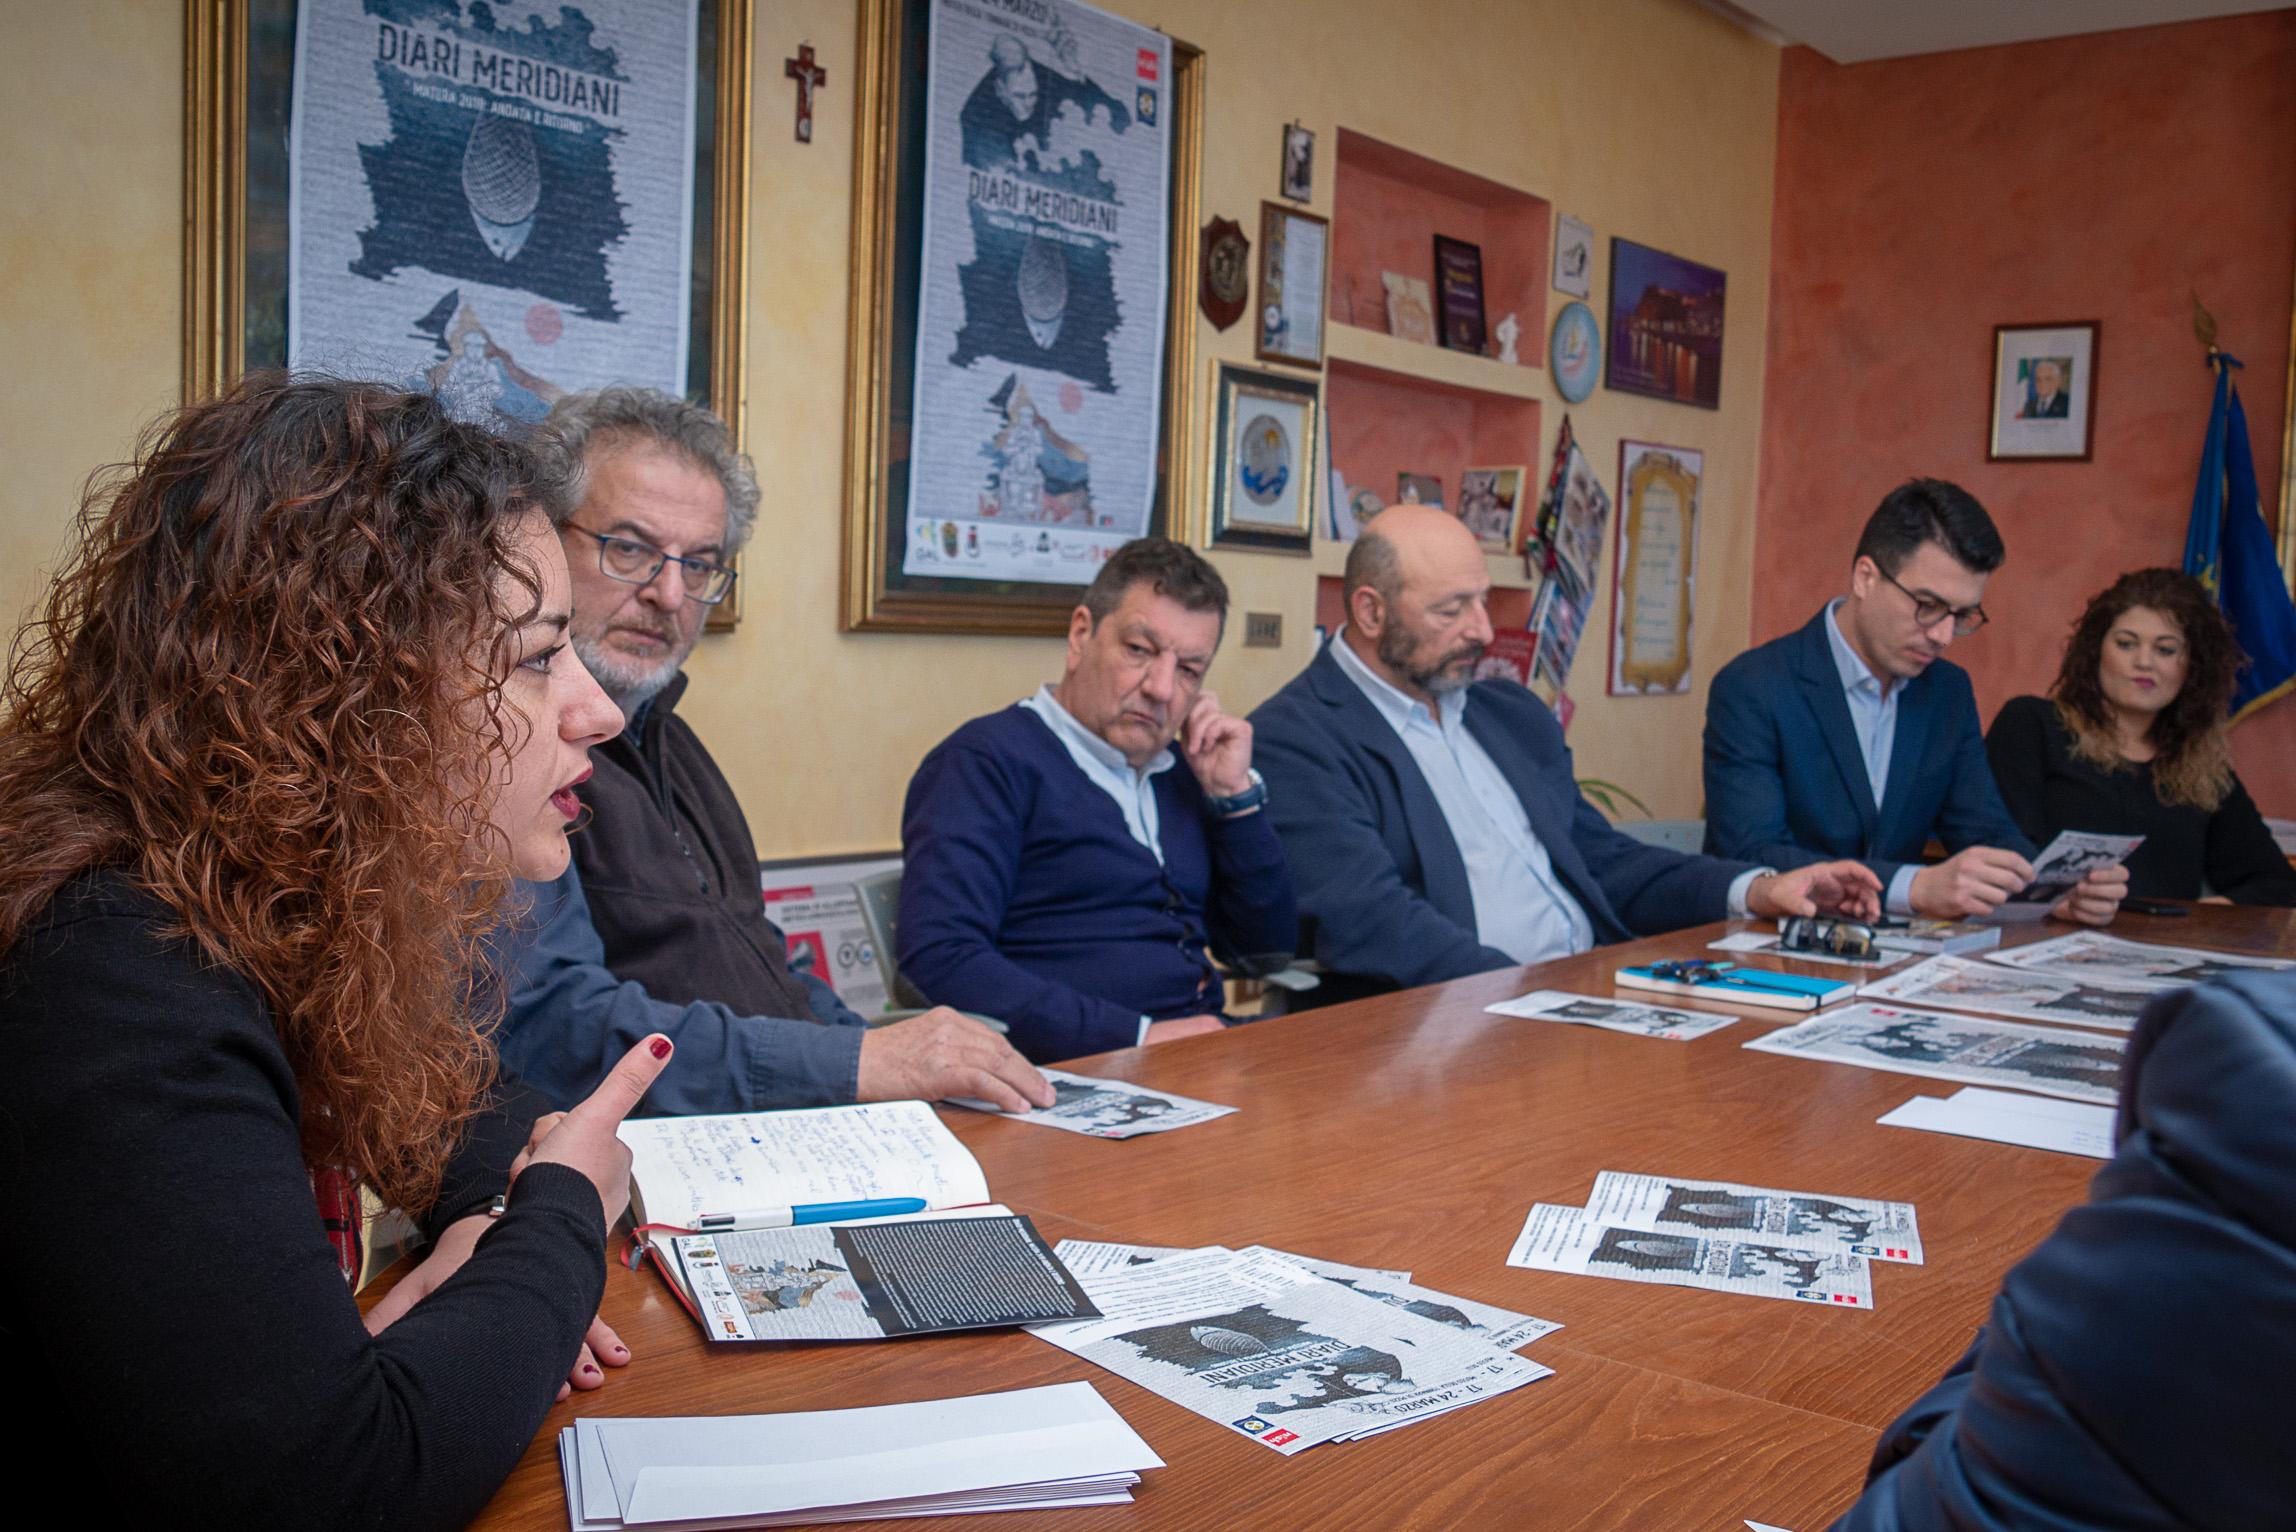 Diari Meridiani, Erica Tuselli, Antonio La Gamba, Ivano Tuselli, Eugenio Attanasio, Gianluca Callipo e Sharon Fanello